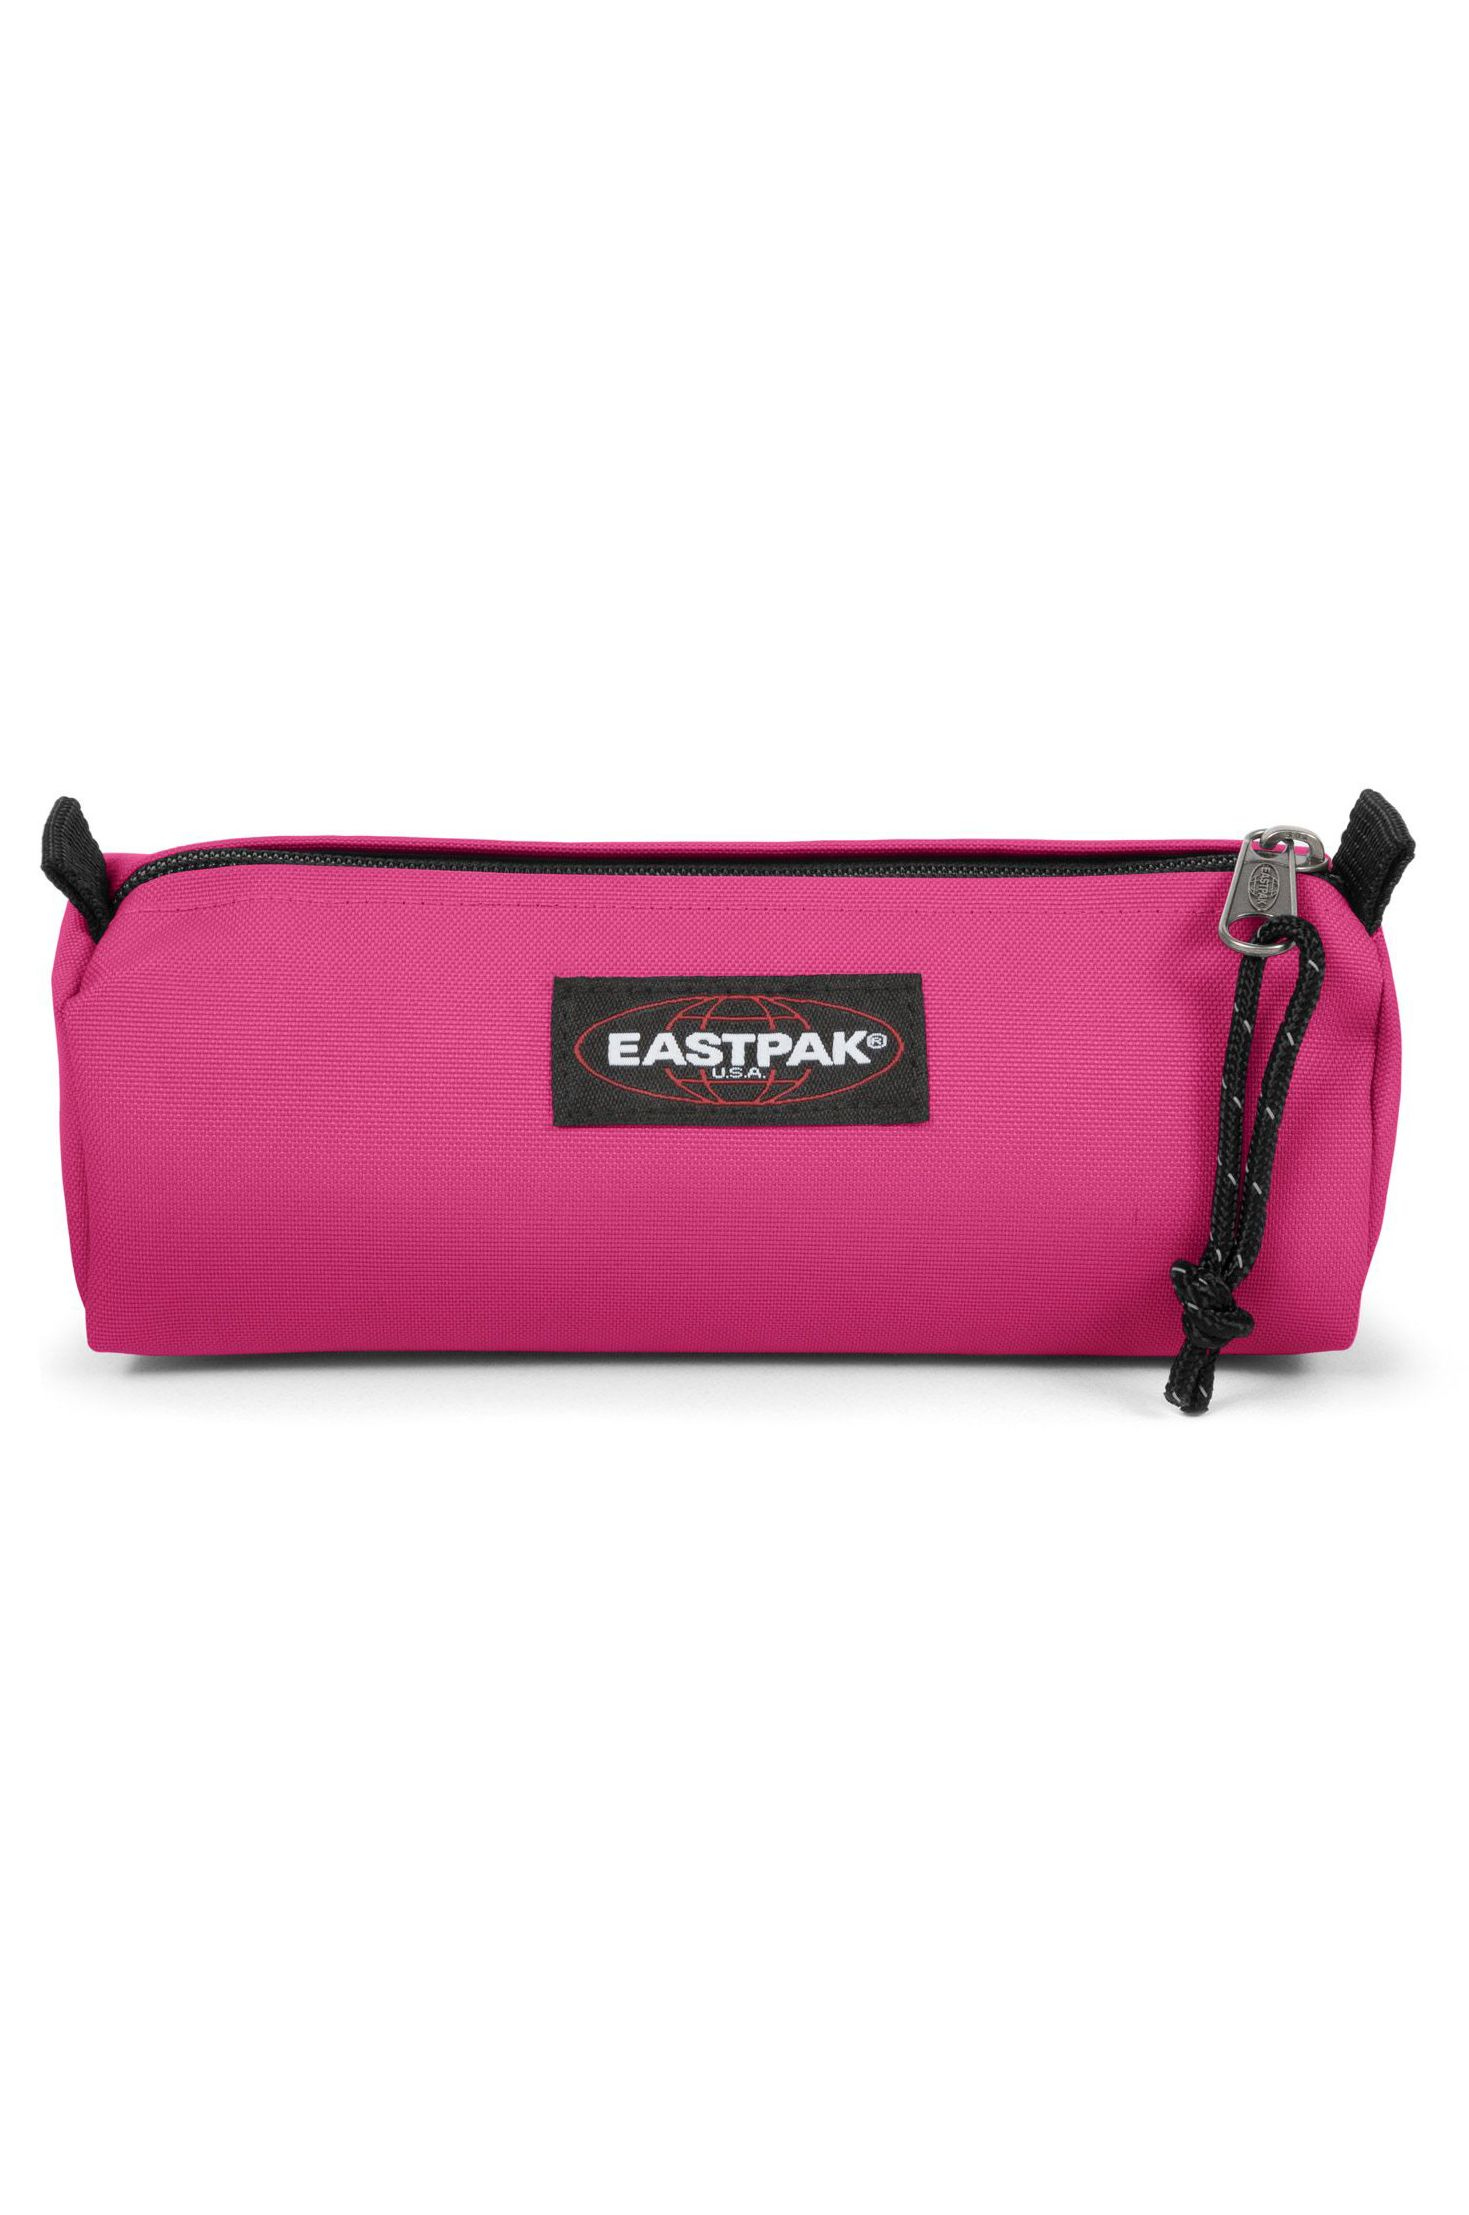 Eastpak Pencil Case BENCHMARK SINGLE Pink Escape